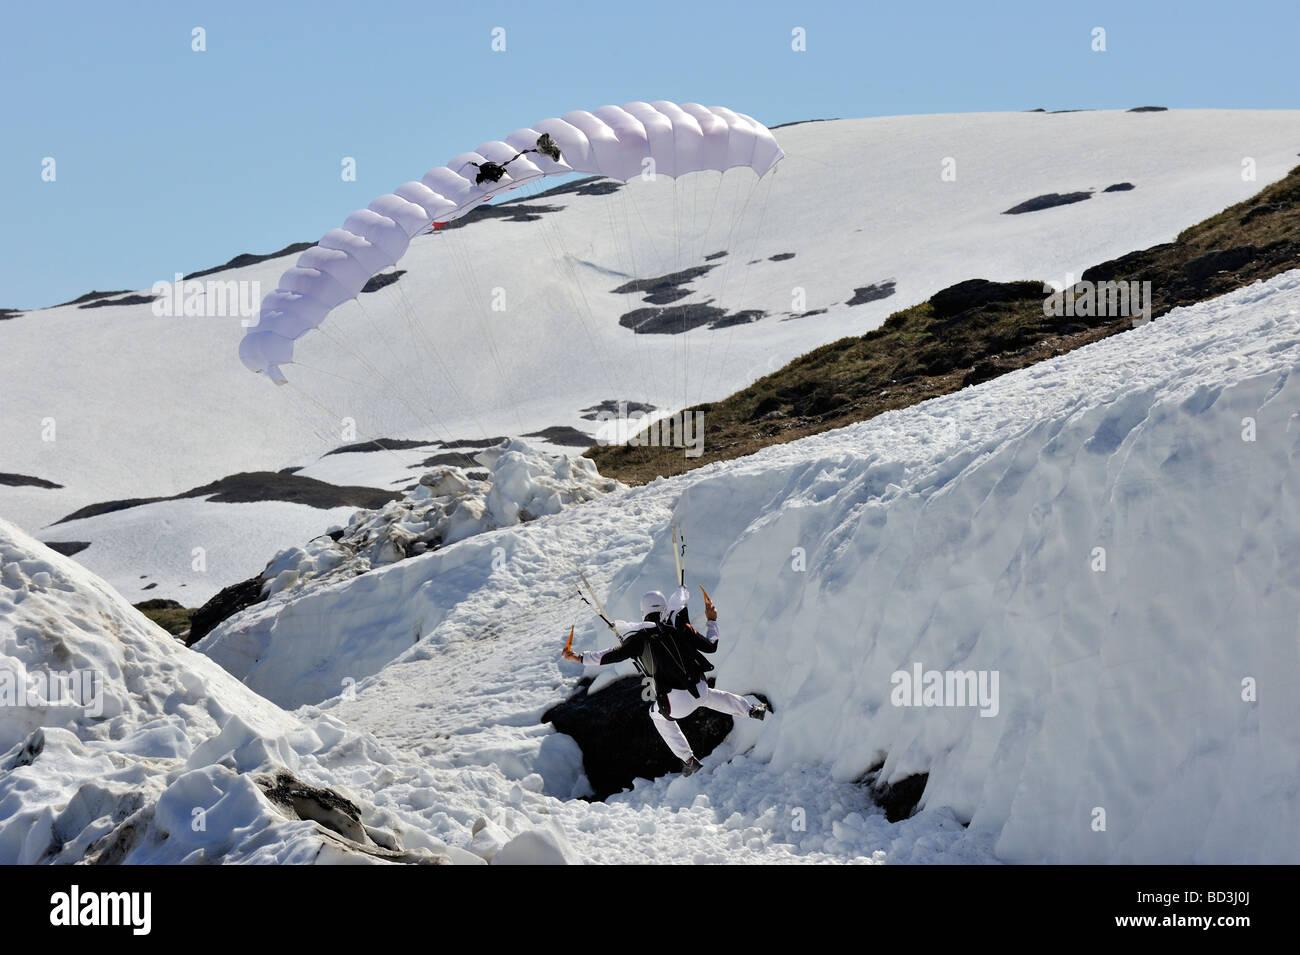 Paraglider landing landing in snow Stock Photo